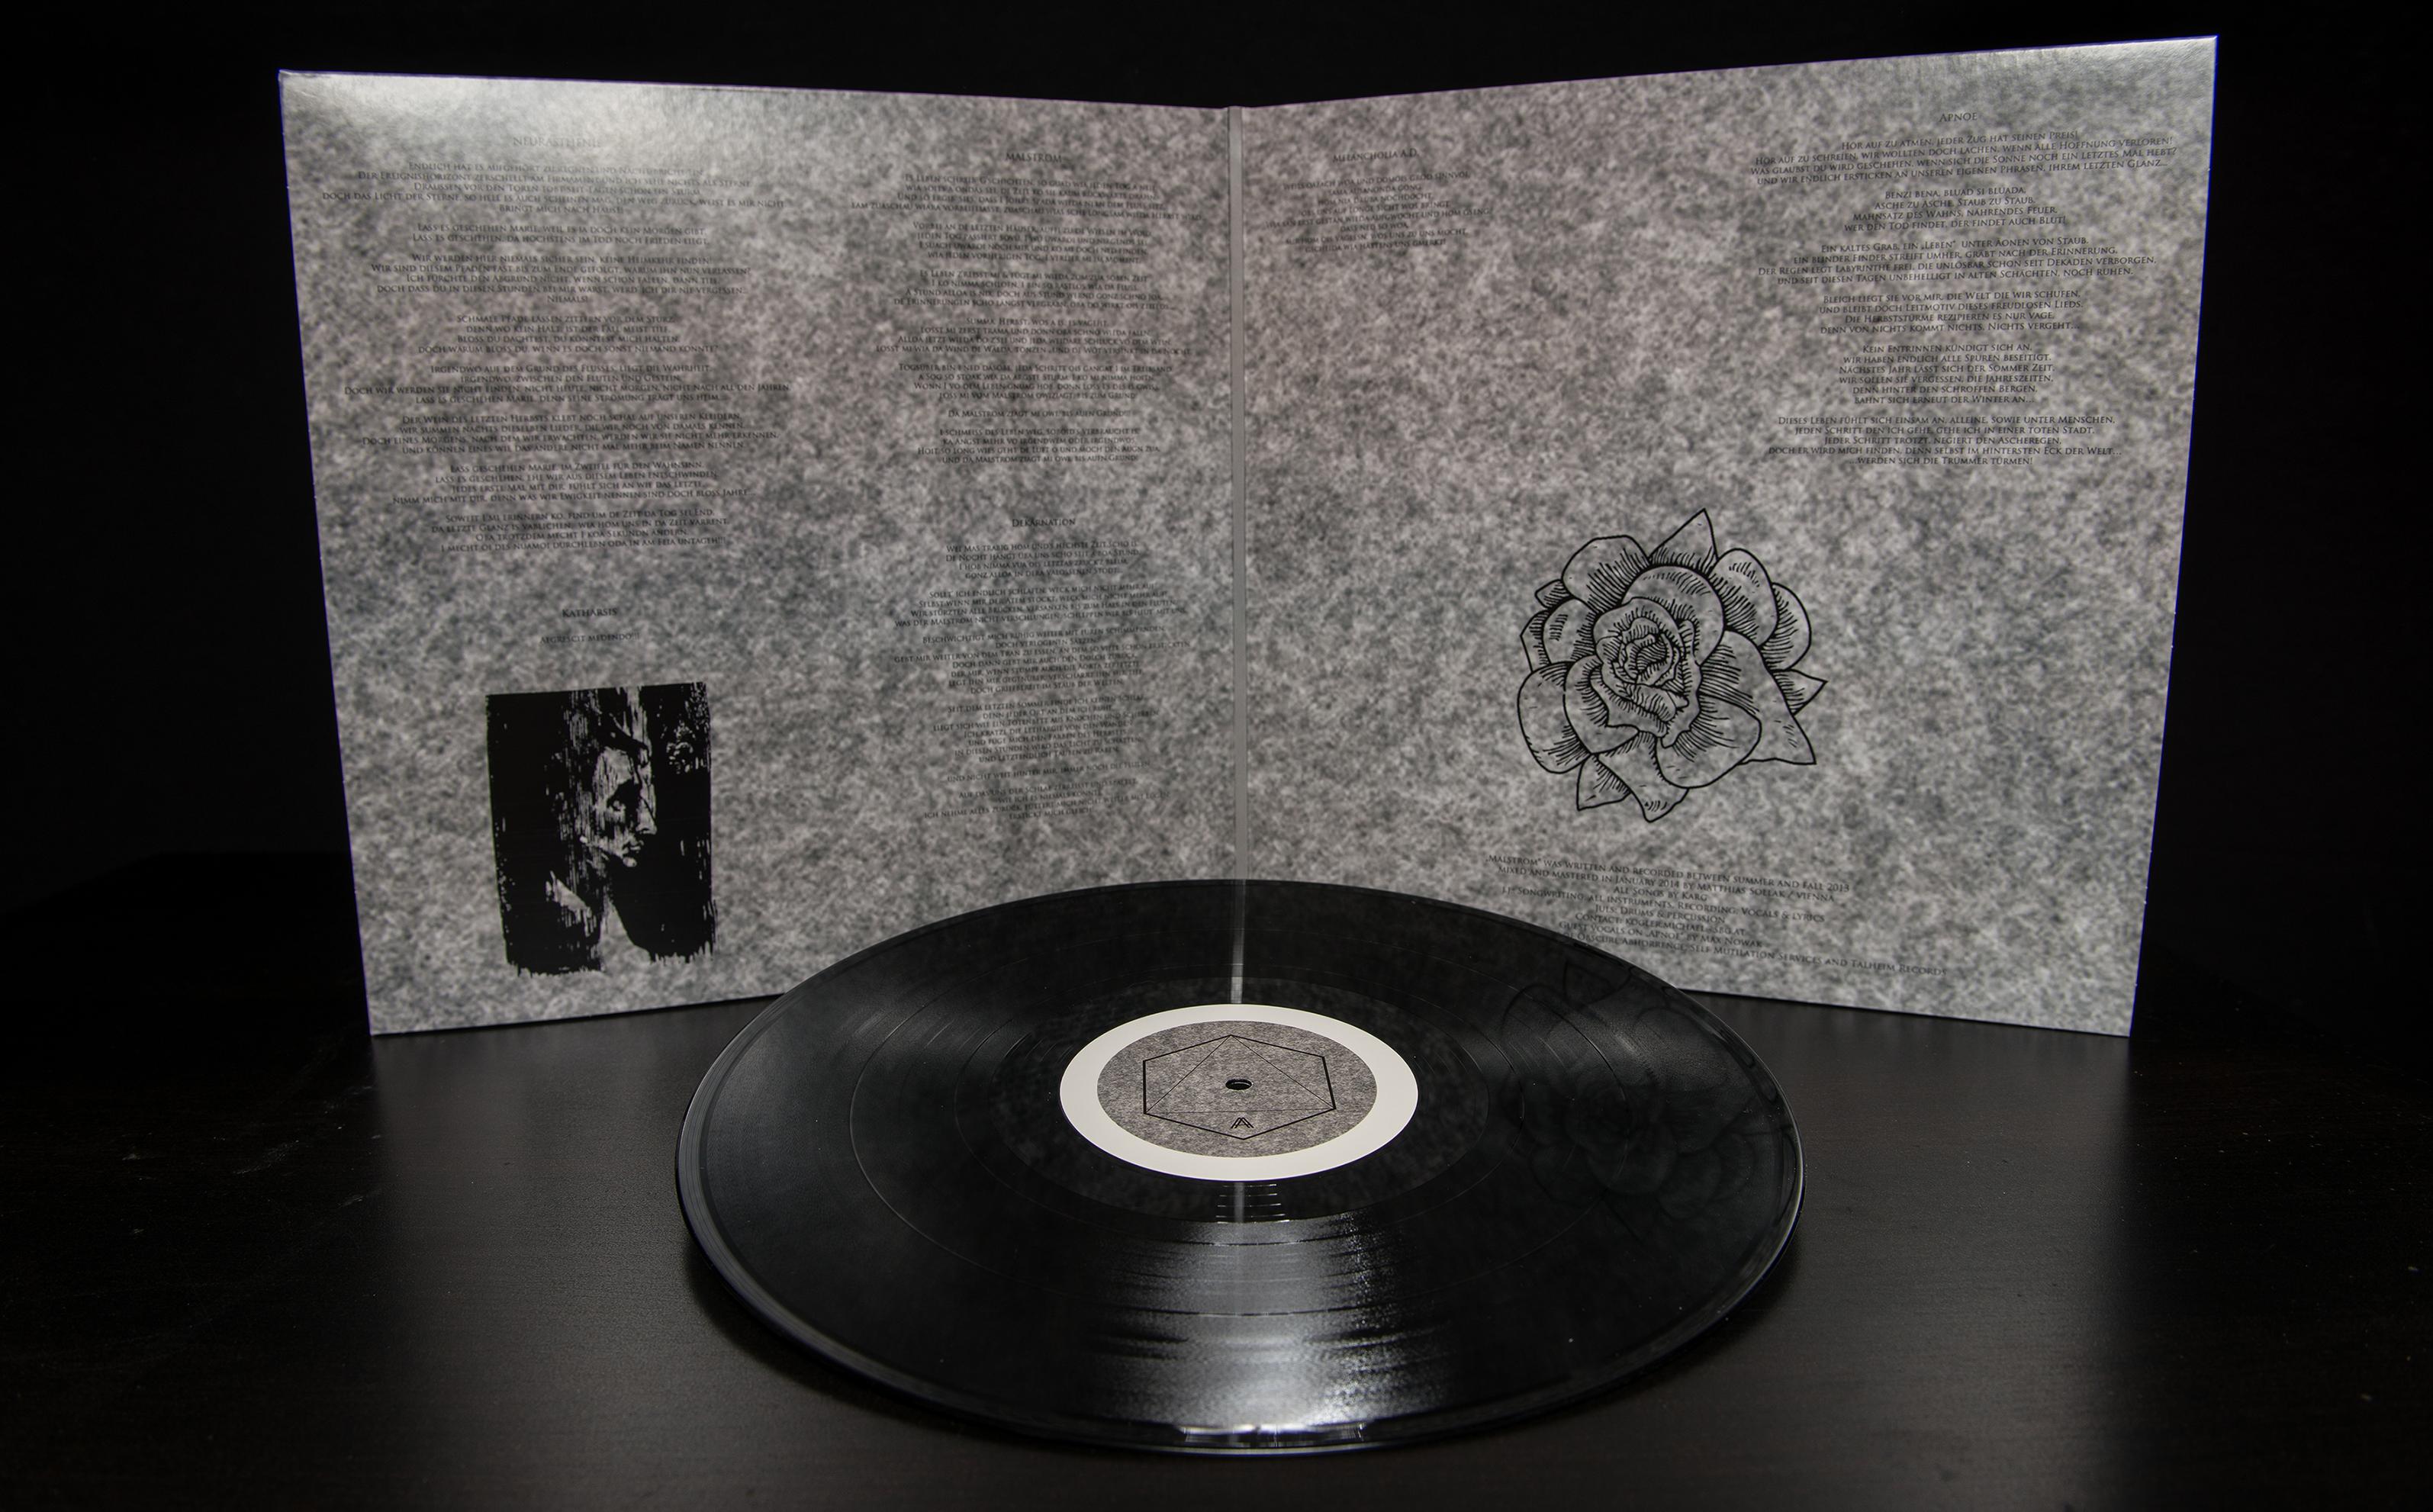 Karg - Malstrom LP Gatefold Black